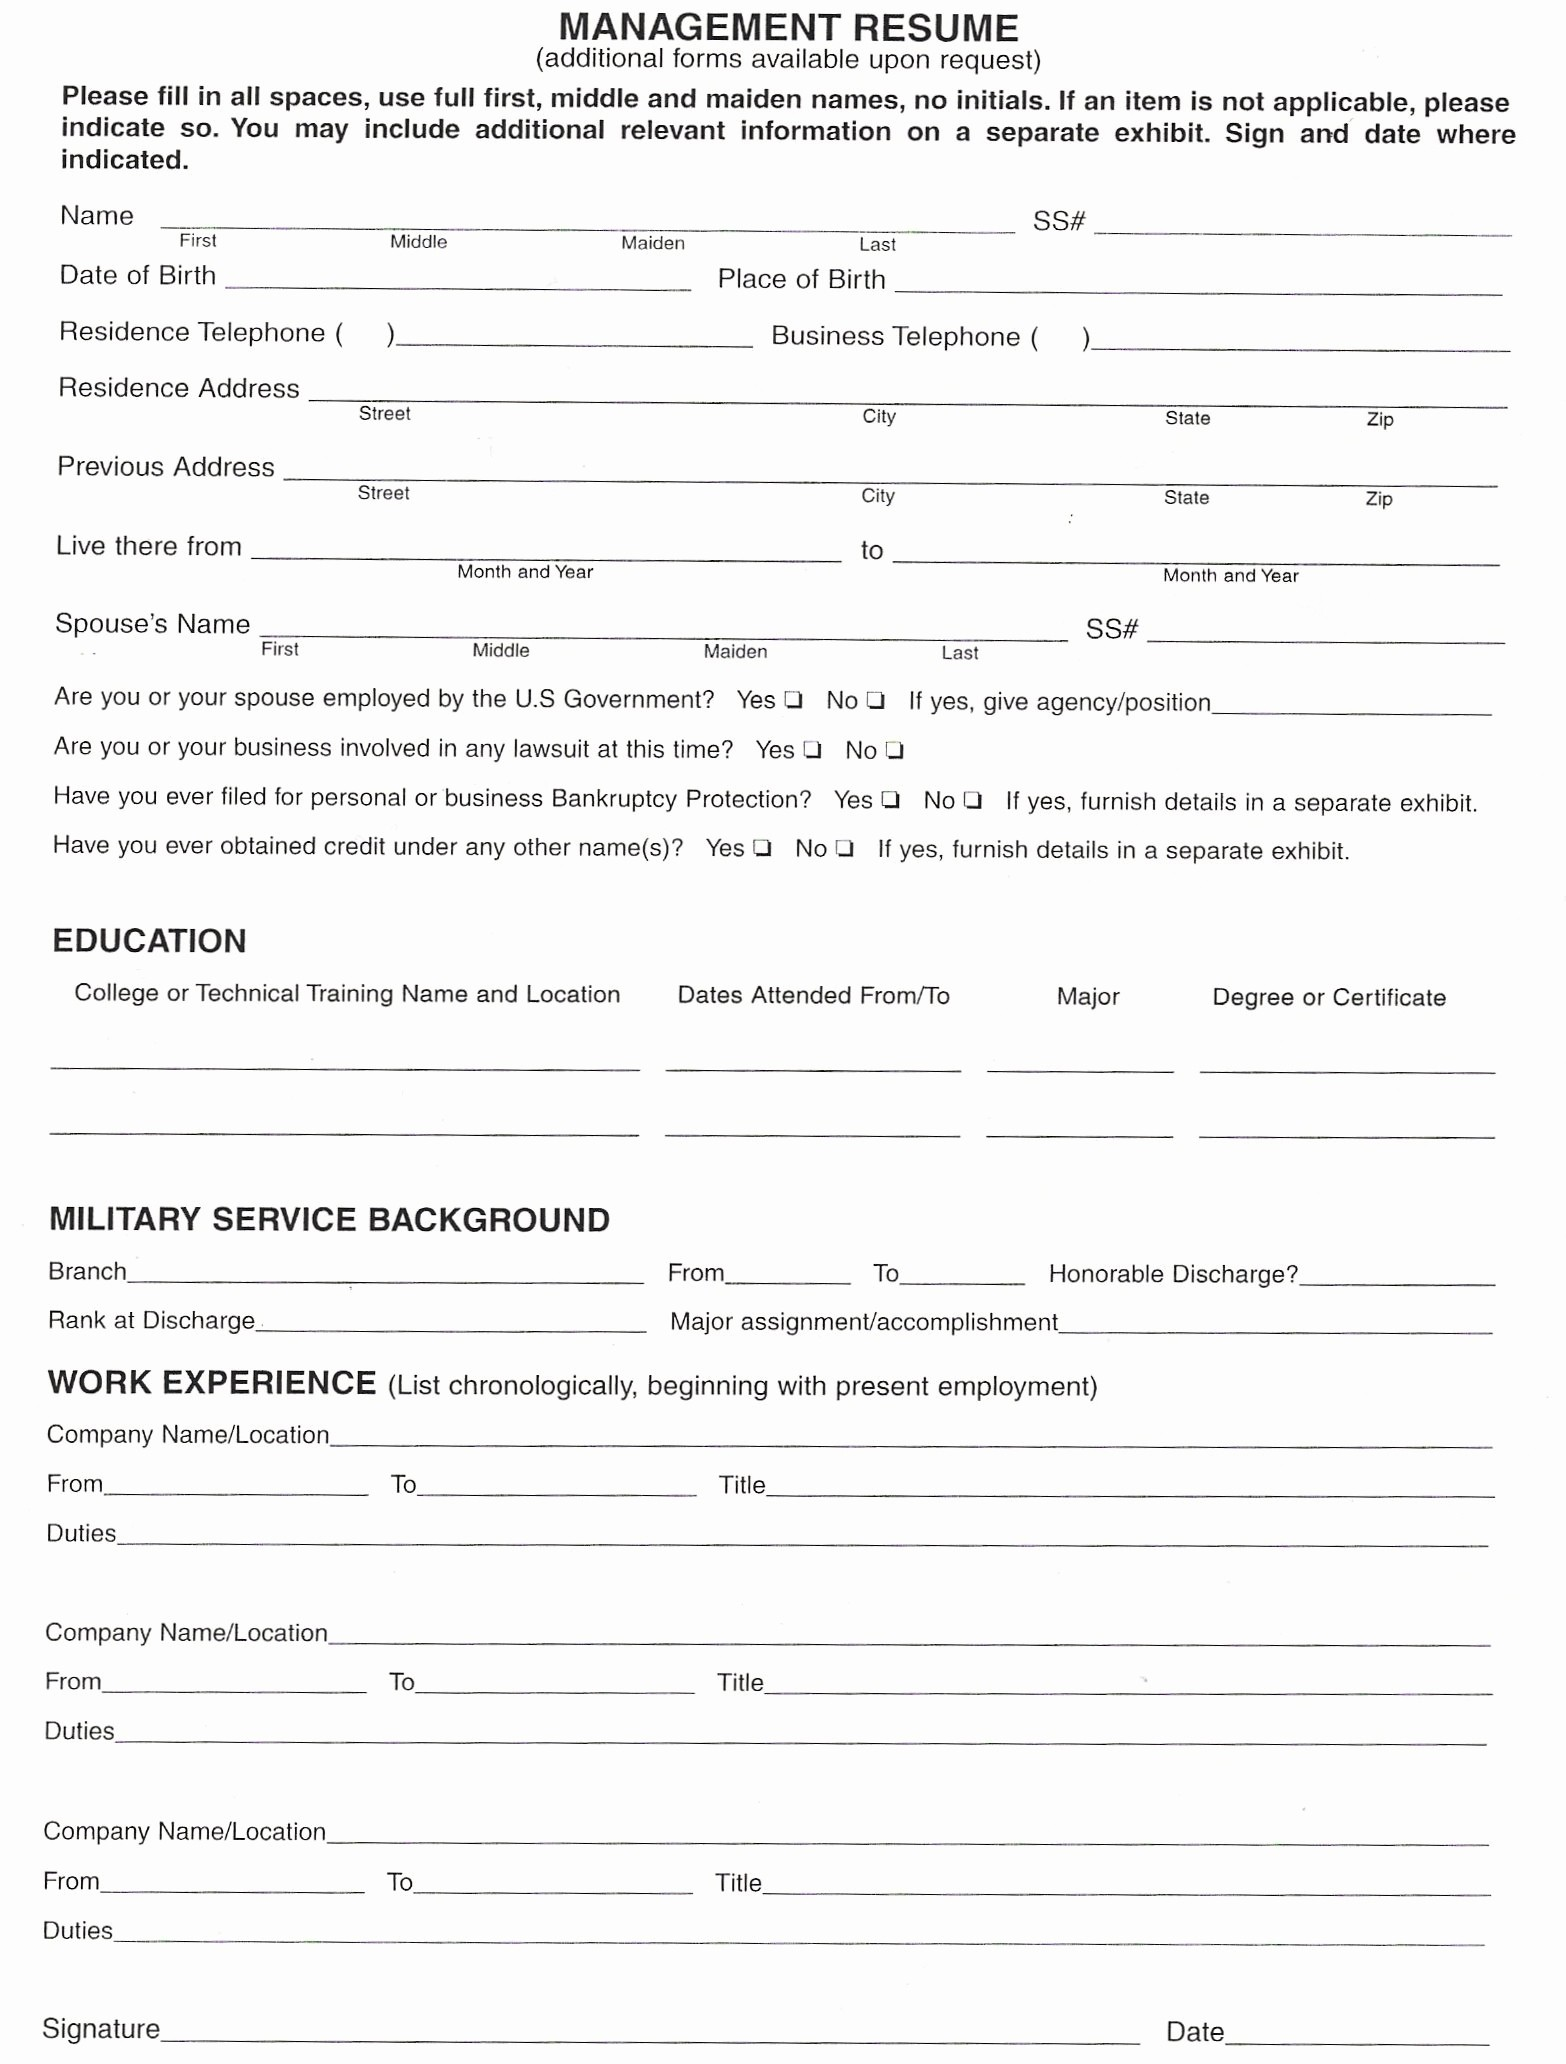 Form Of Resume for Job Unique Resume form